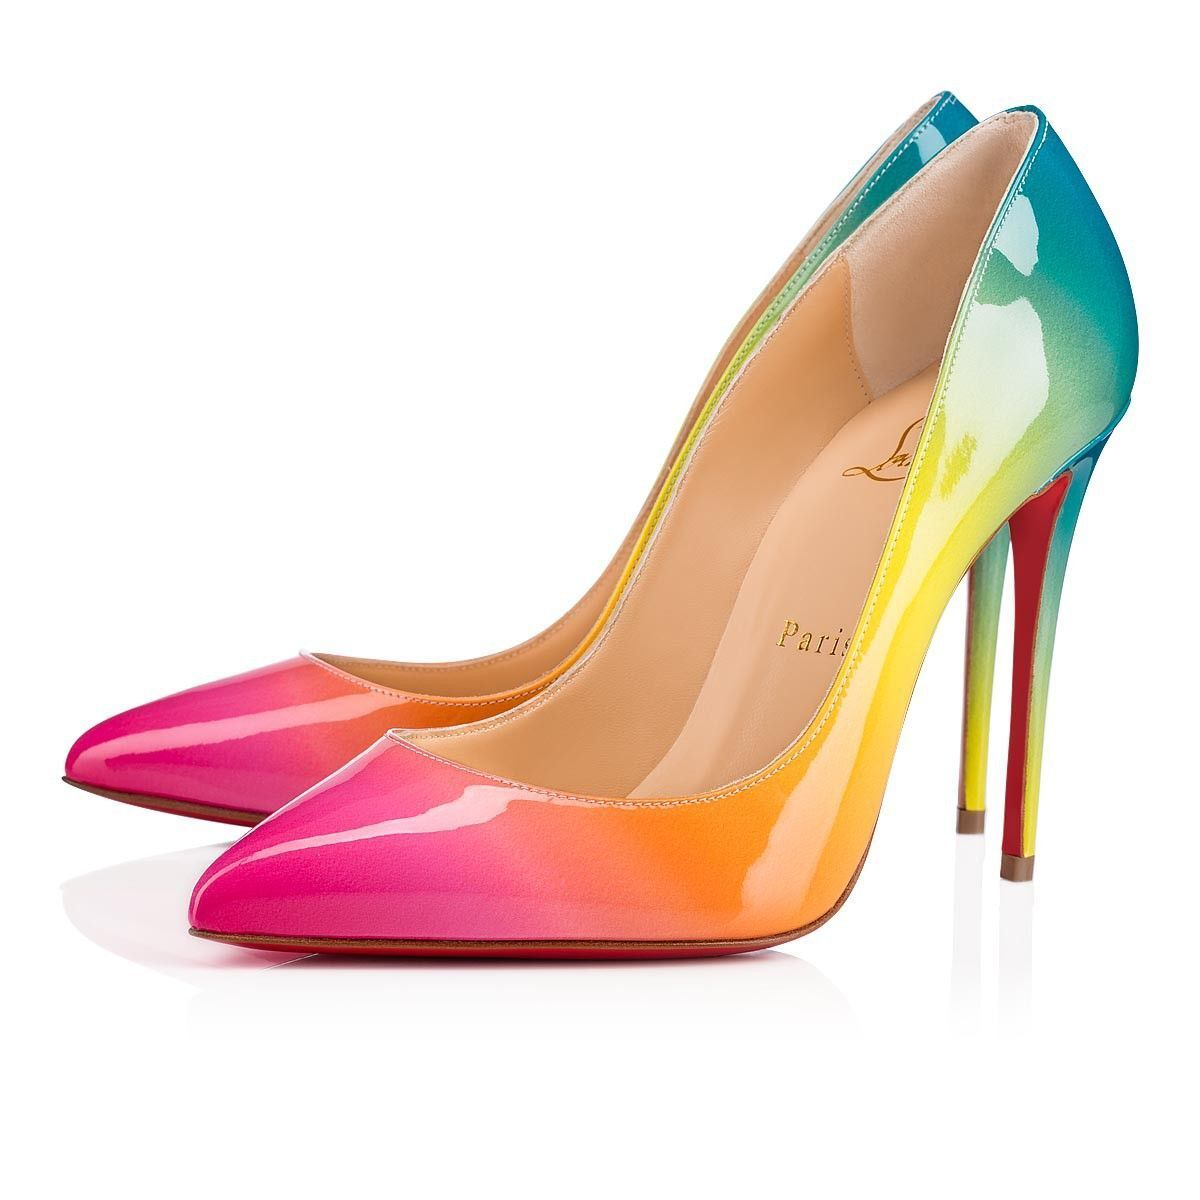 NIB Christian Louboutin Pigalle Follies 100 Sunrise Pink Patent Heel Pump 35